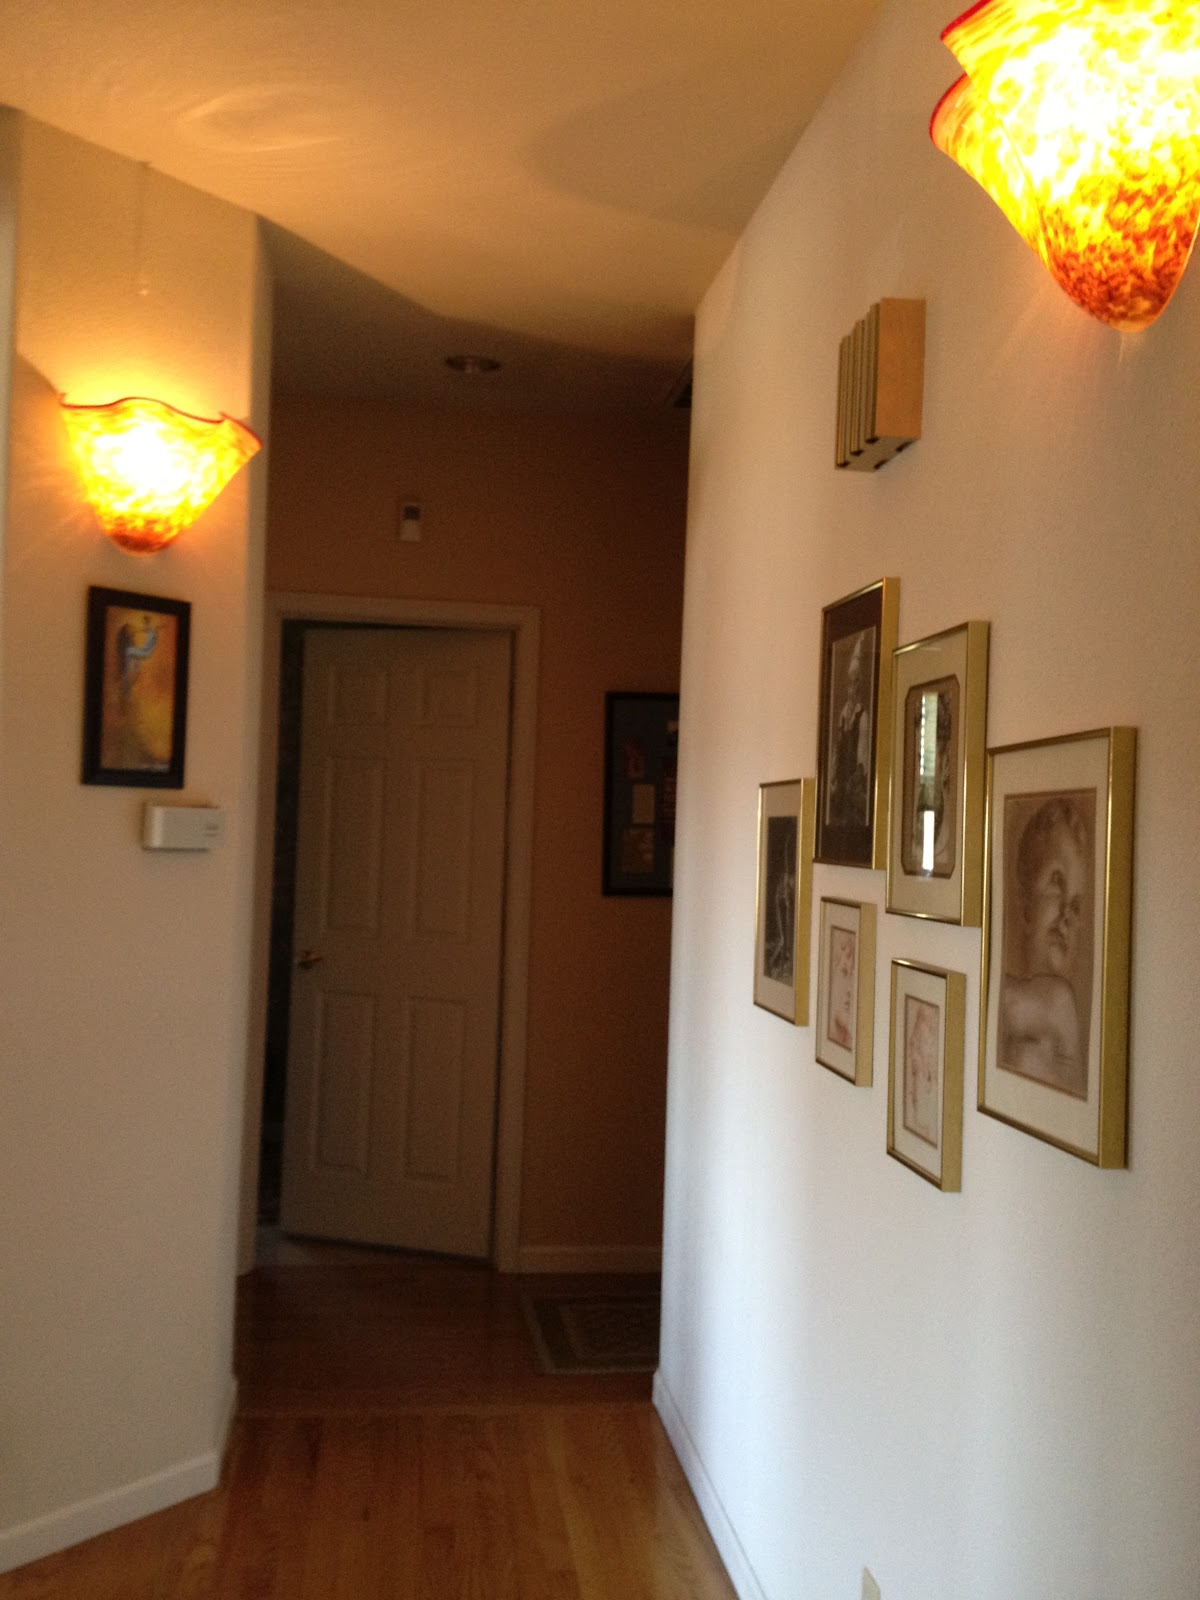 Feng shui by maria feng shui hallways - Mirror in hallway feng shui ...